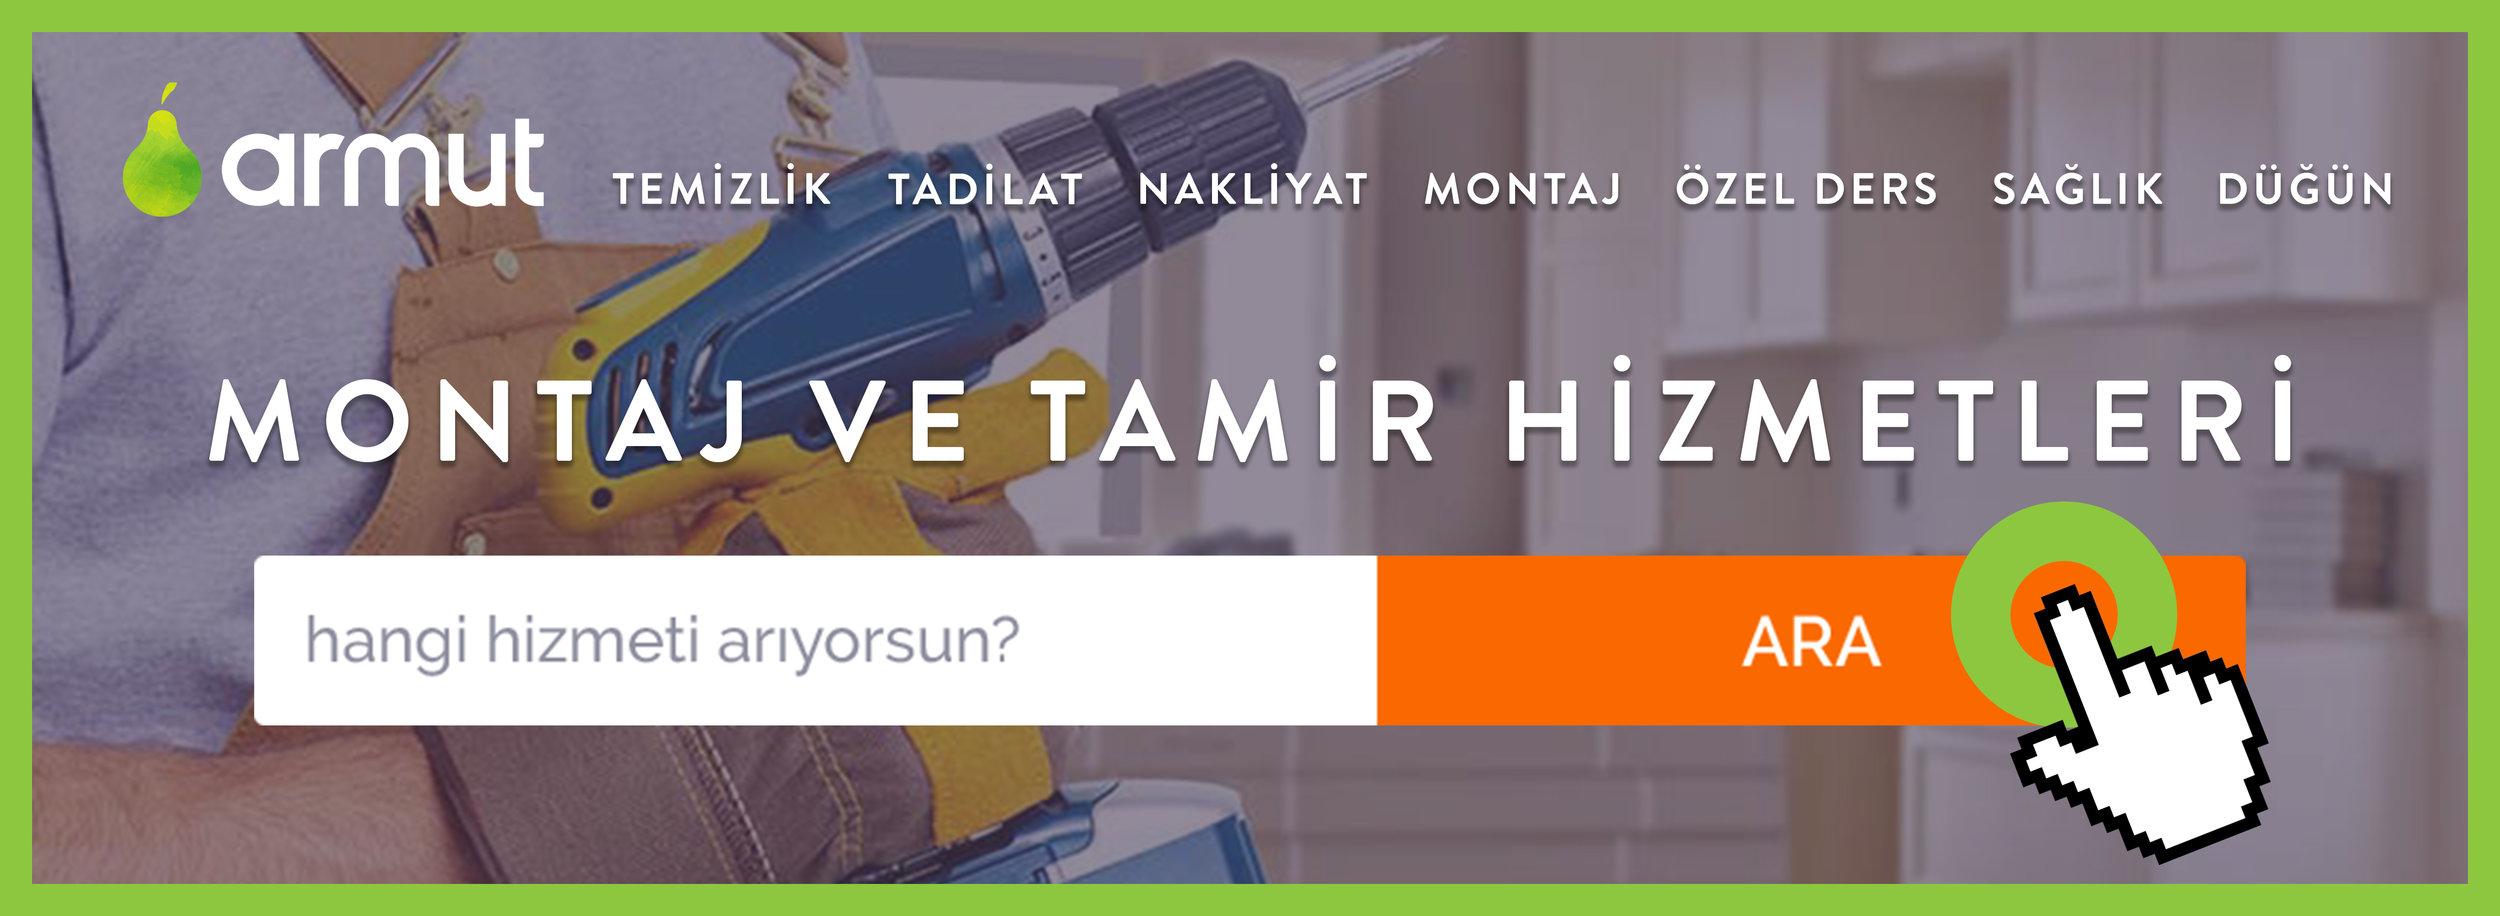 armut.com-usta